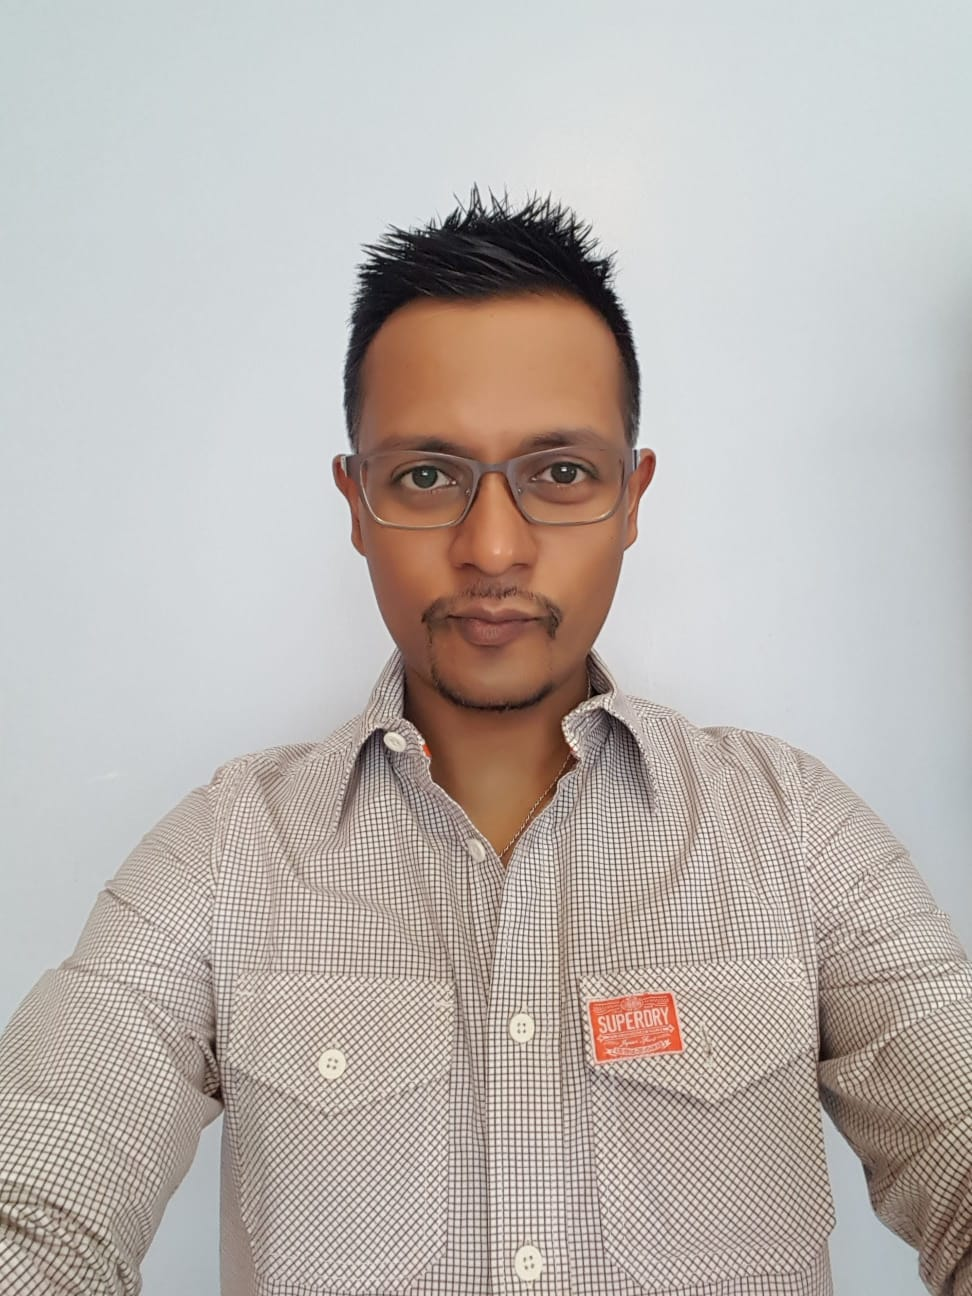 Mr. Kunal R. Mehta